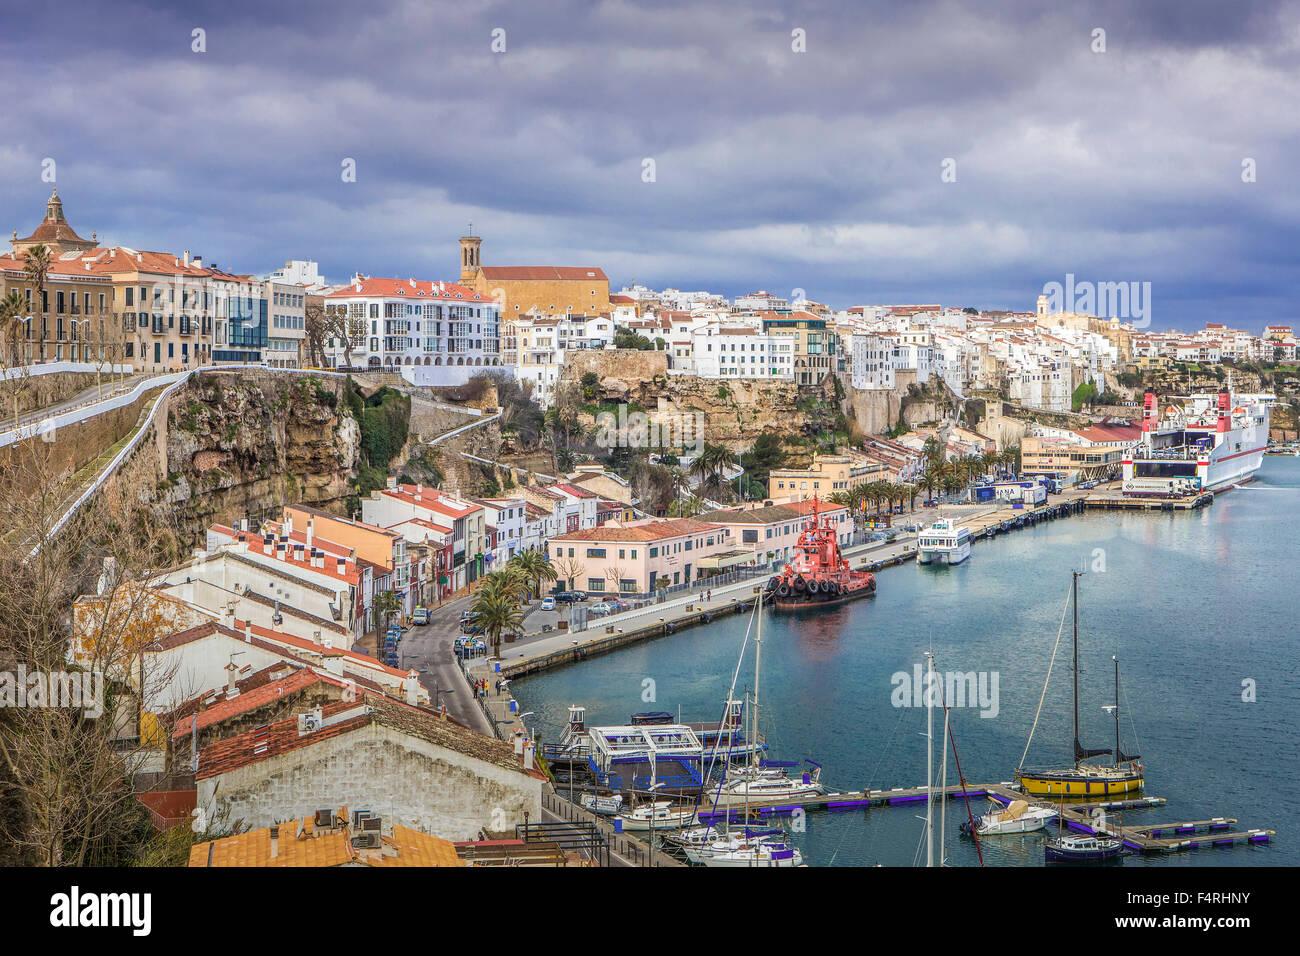 Balearen, Landschaft, Mao, Stadt, Menorca, Insel, Spanien, Europa, Frühling, Architektur, Klippe, mediterran, Stockbild